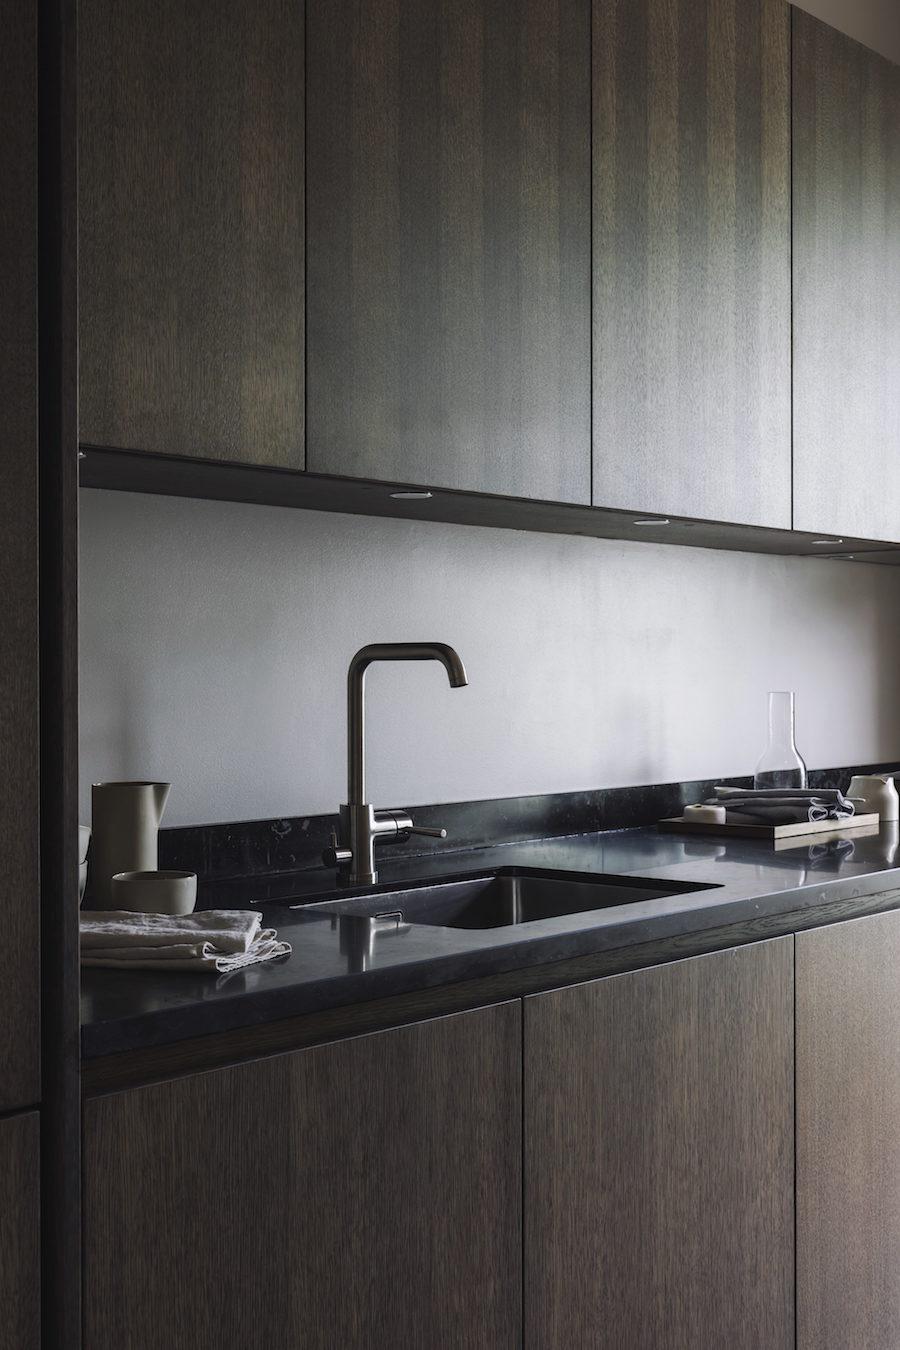 Bild på Asplunds nya kök som kommer i mörkt rök ek.